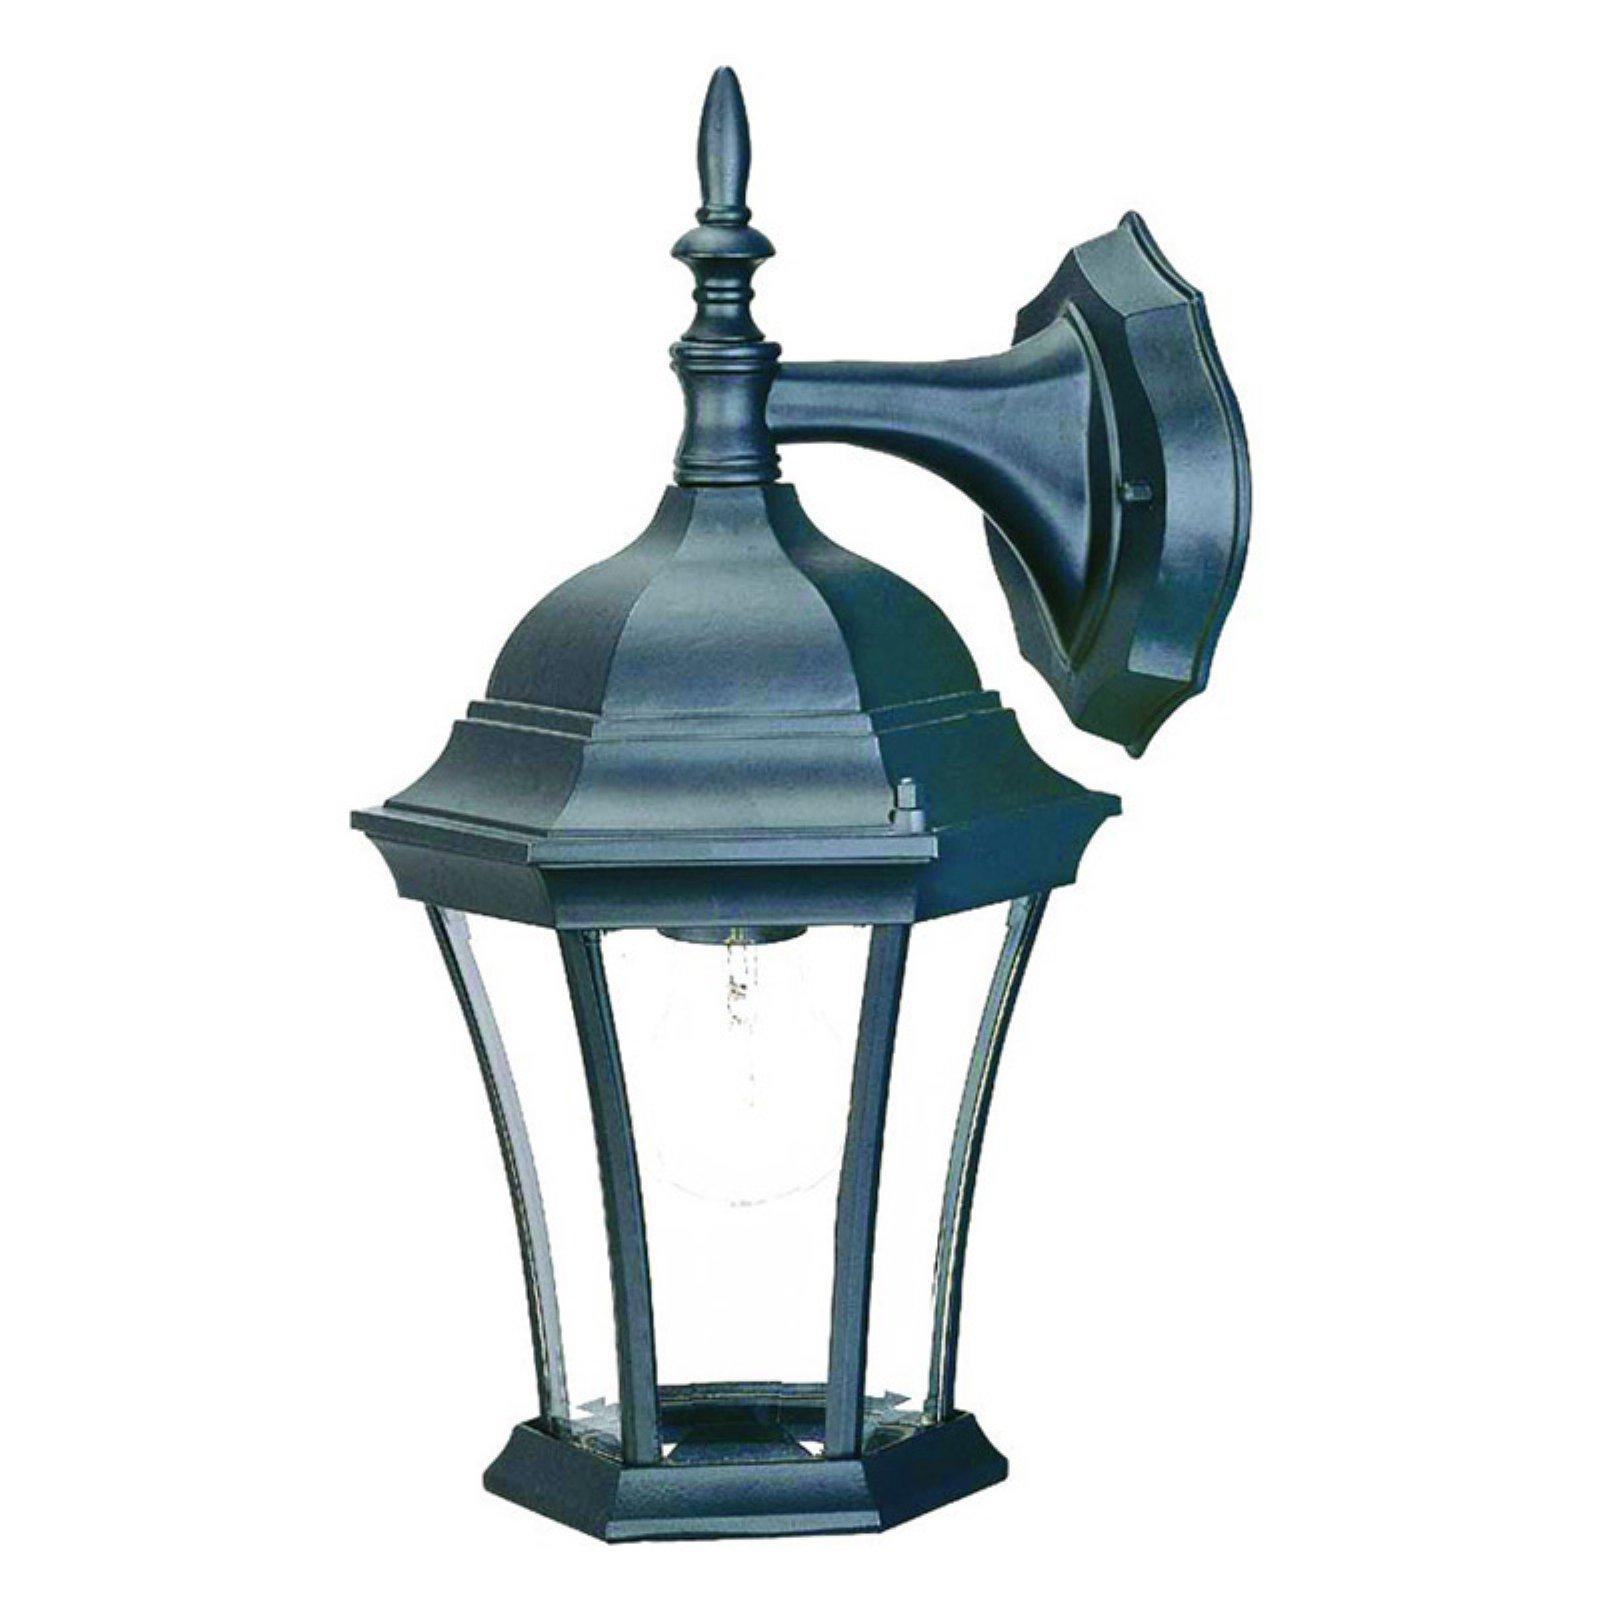 Acclaim Lighting Bryn Mawr 1 Light Outdoor Wall Mount Light Fixture